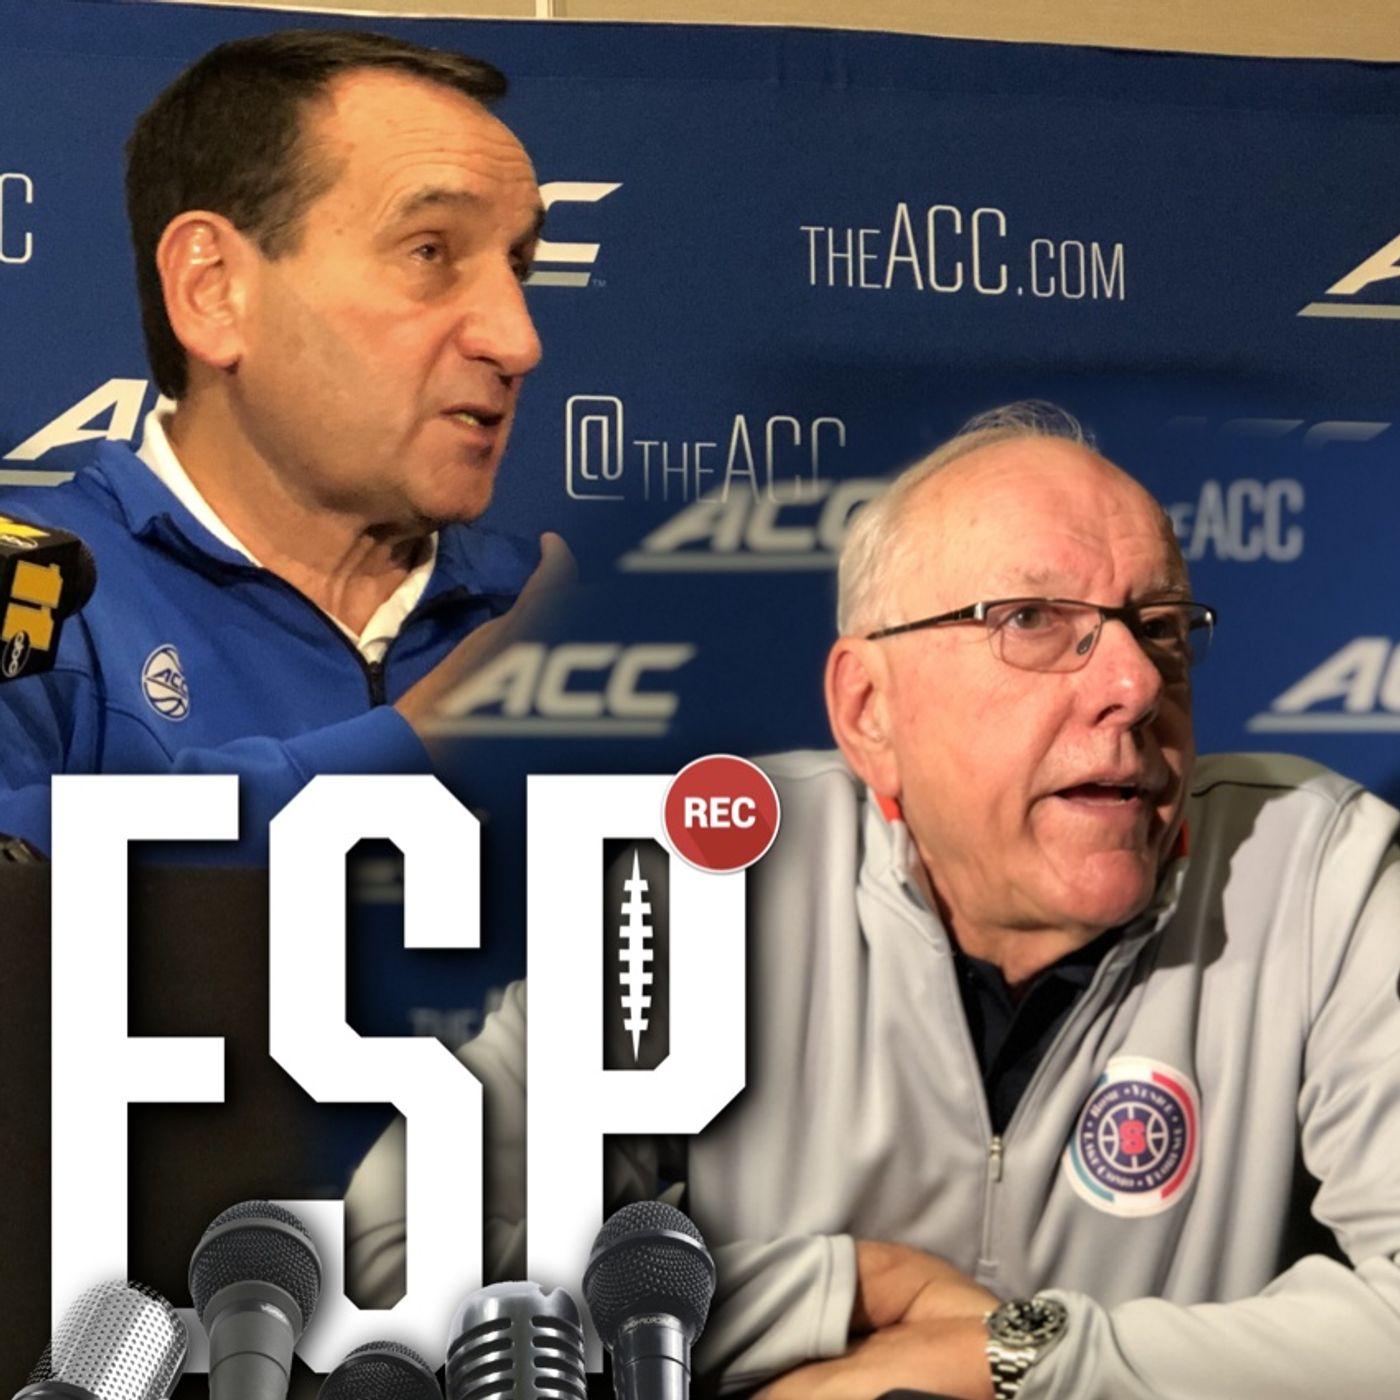 #ESPodcast Ep. 12 - Best HSFB Rivalries in SC, Coach K, Jim Boeheim Interviews